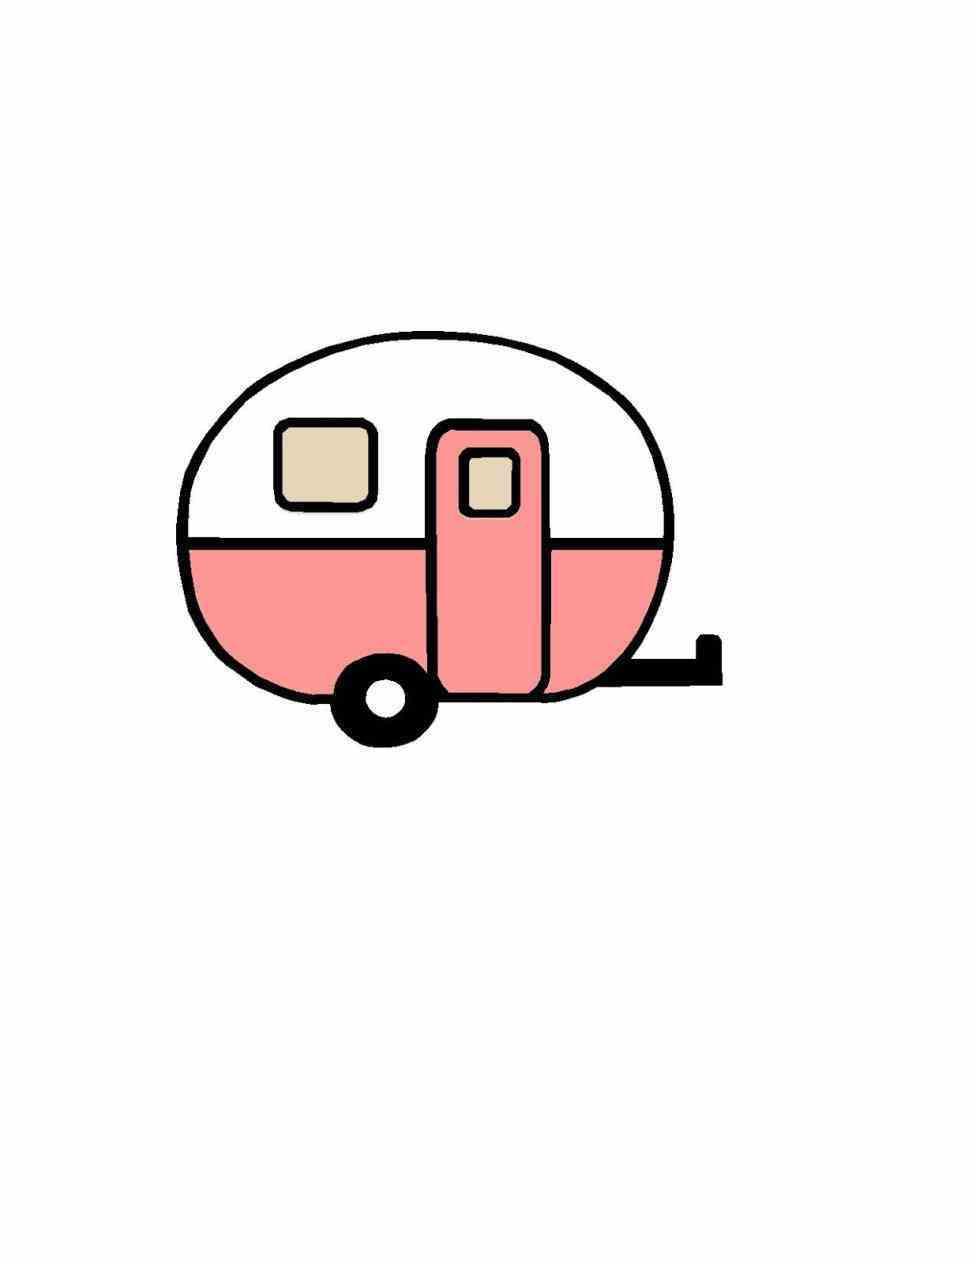 976x1264 Design File Caravan Commercial Use Detailed Caravan Vintage Rv